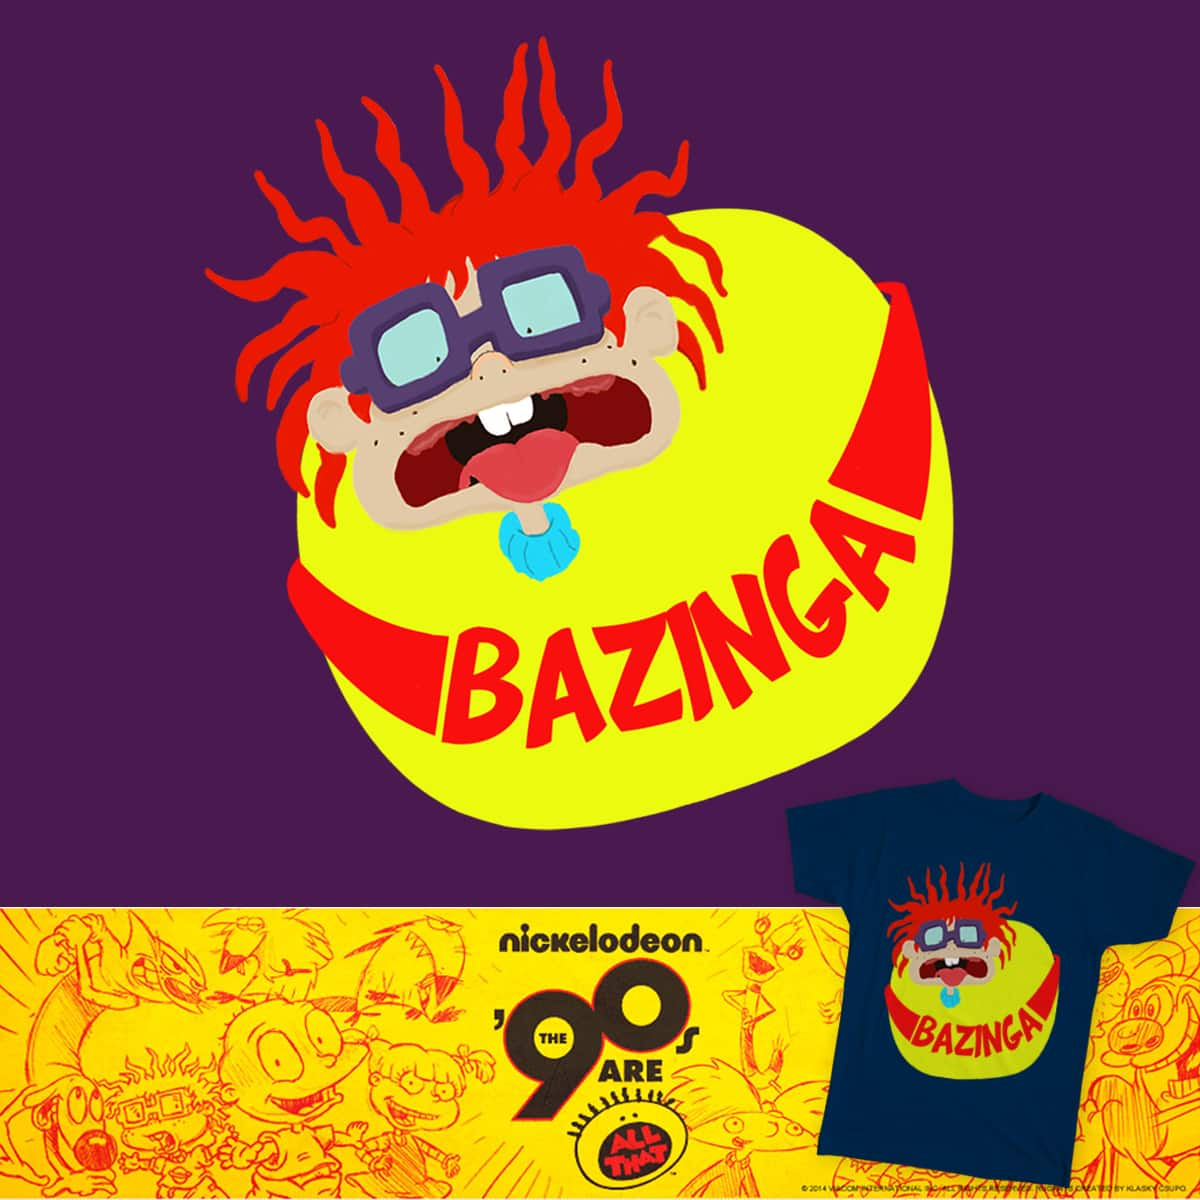 Chuckie Einsten's Pose and Bazinga by mickaelramom on Threadless